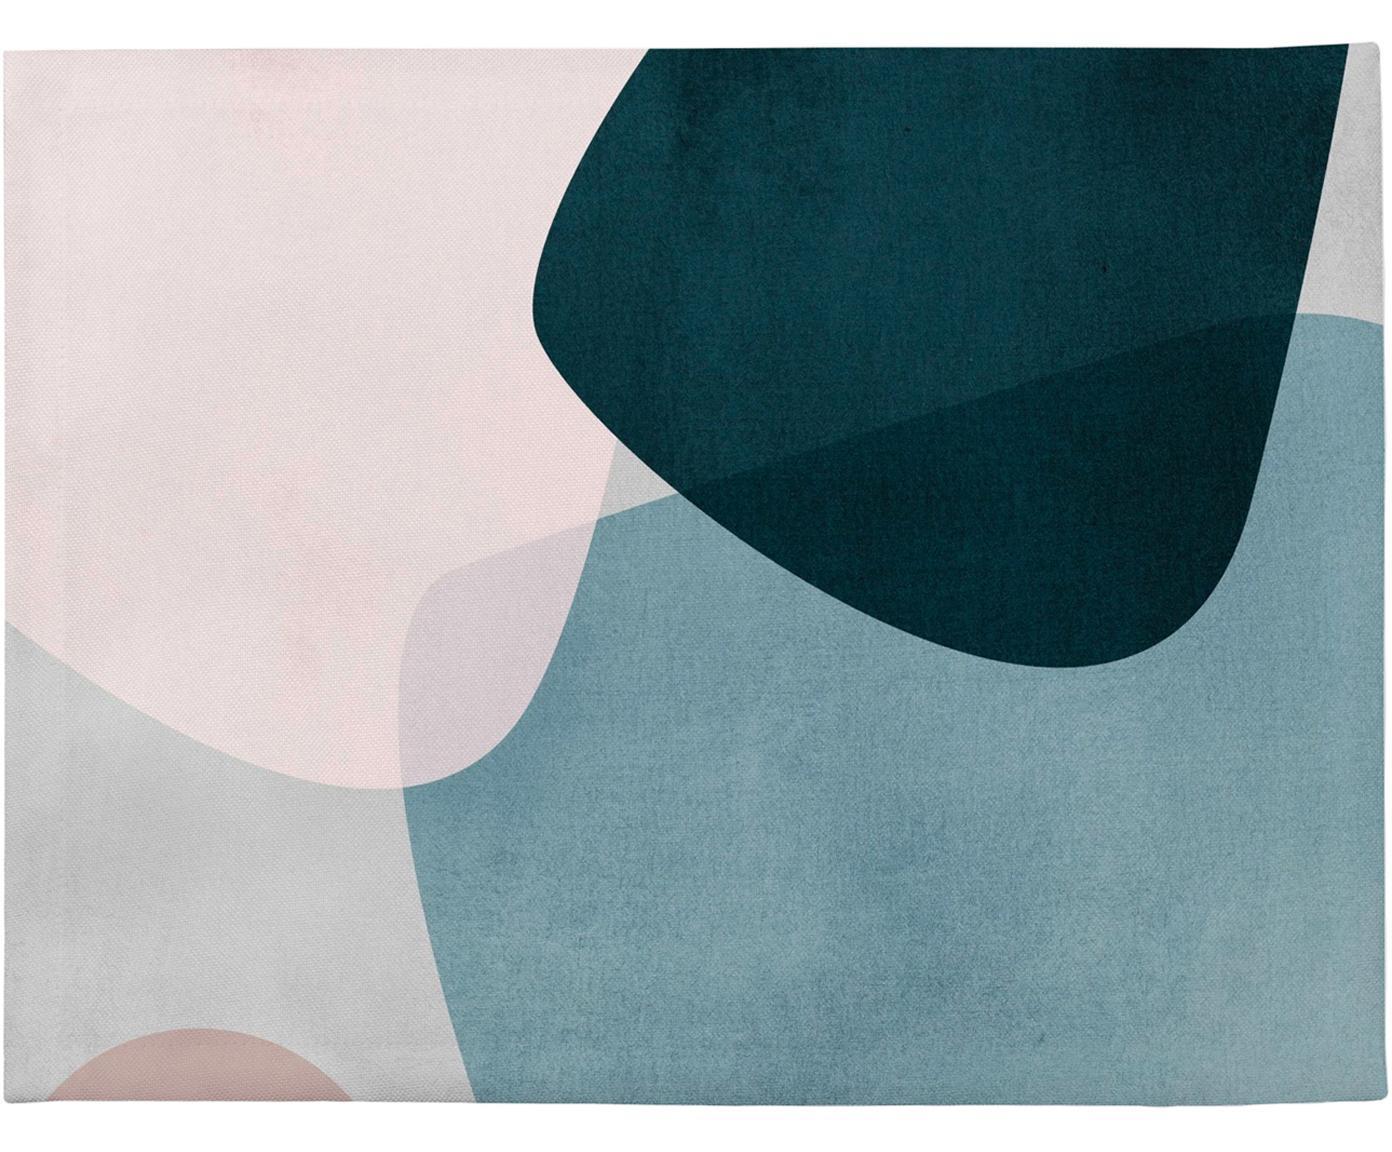 Manteles individuales Graphic, 4uds., Poliéster, Azul oscuro, azul, gris, rosa, An 35 x L 45 cm